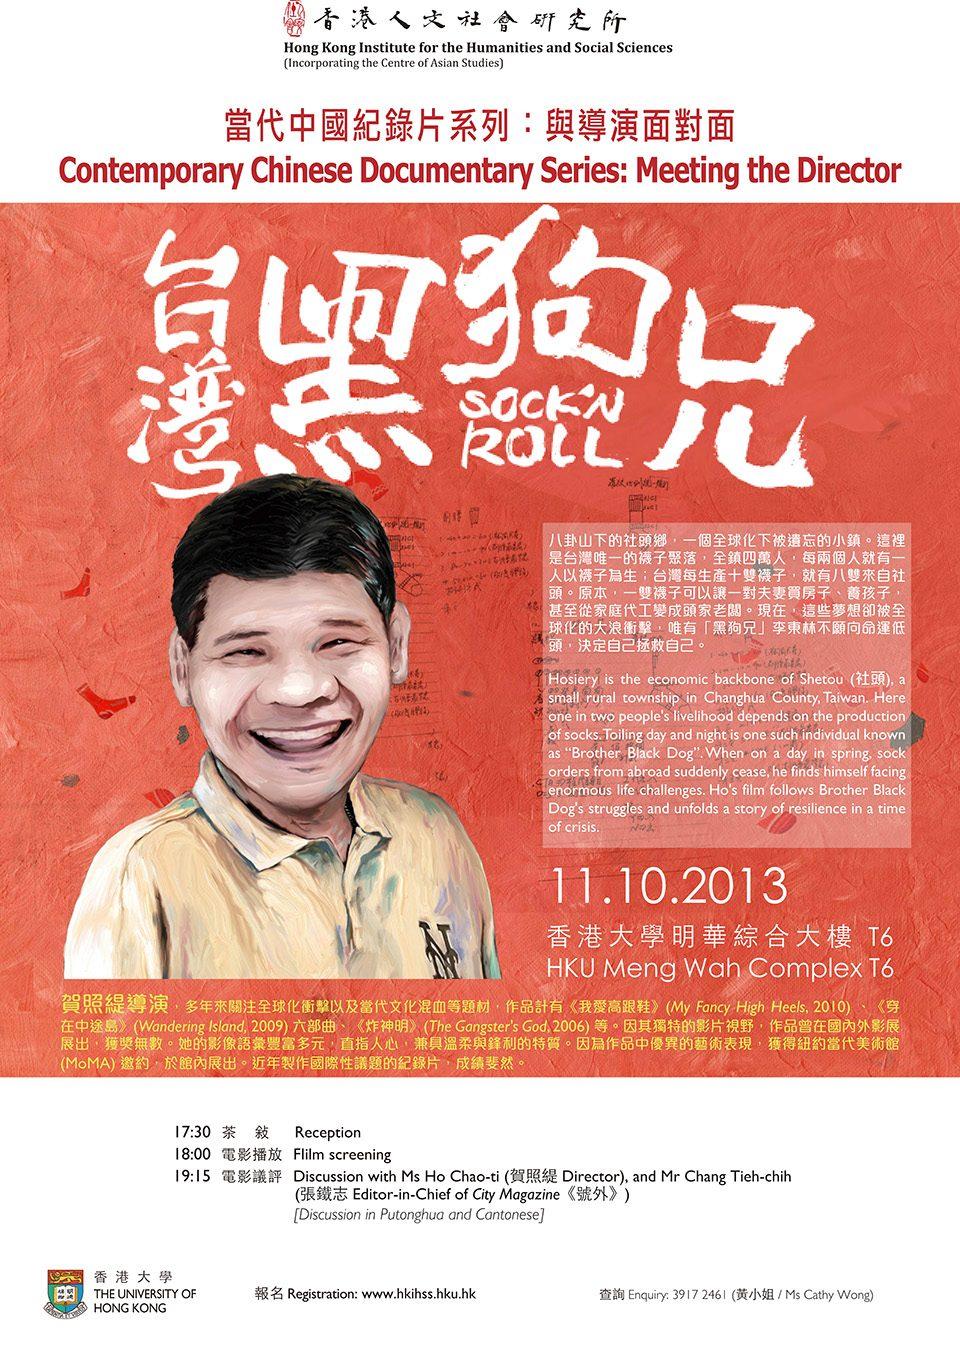 Sock'N Roll 台灣黑狗兄 (October 11, 2013)